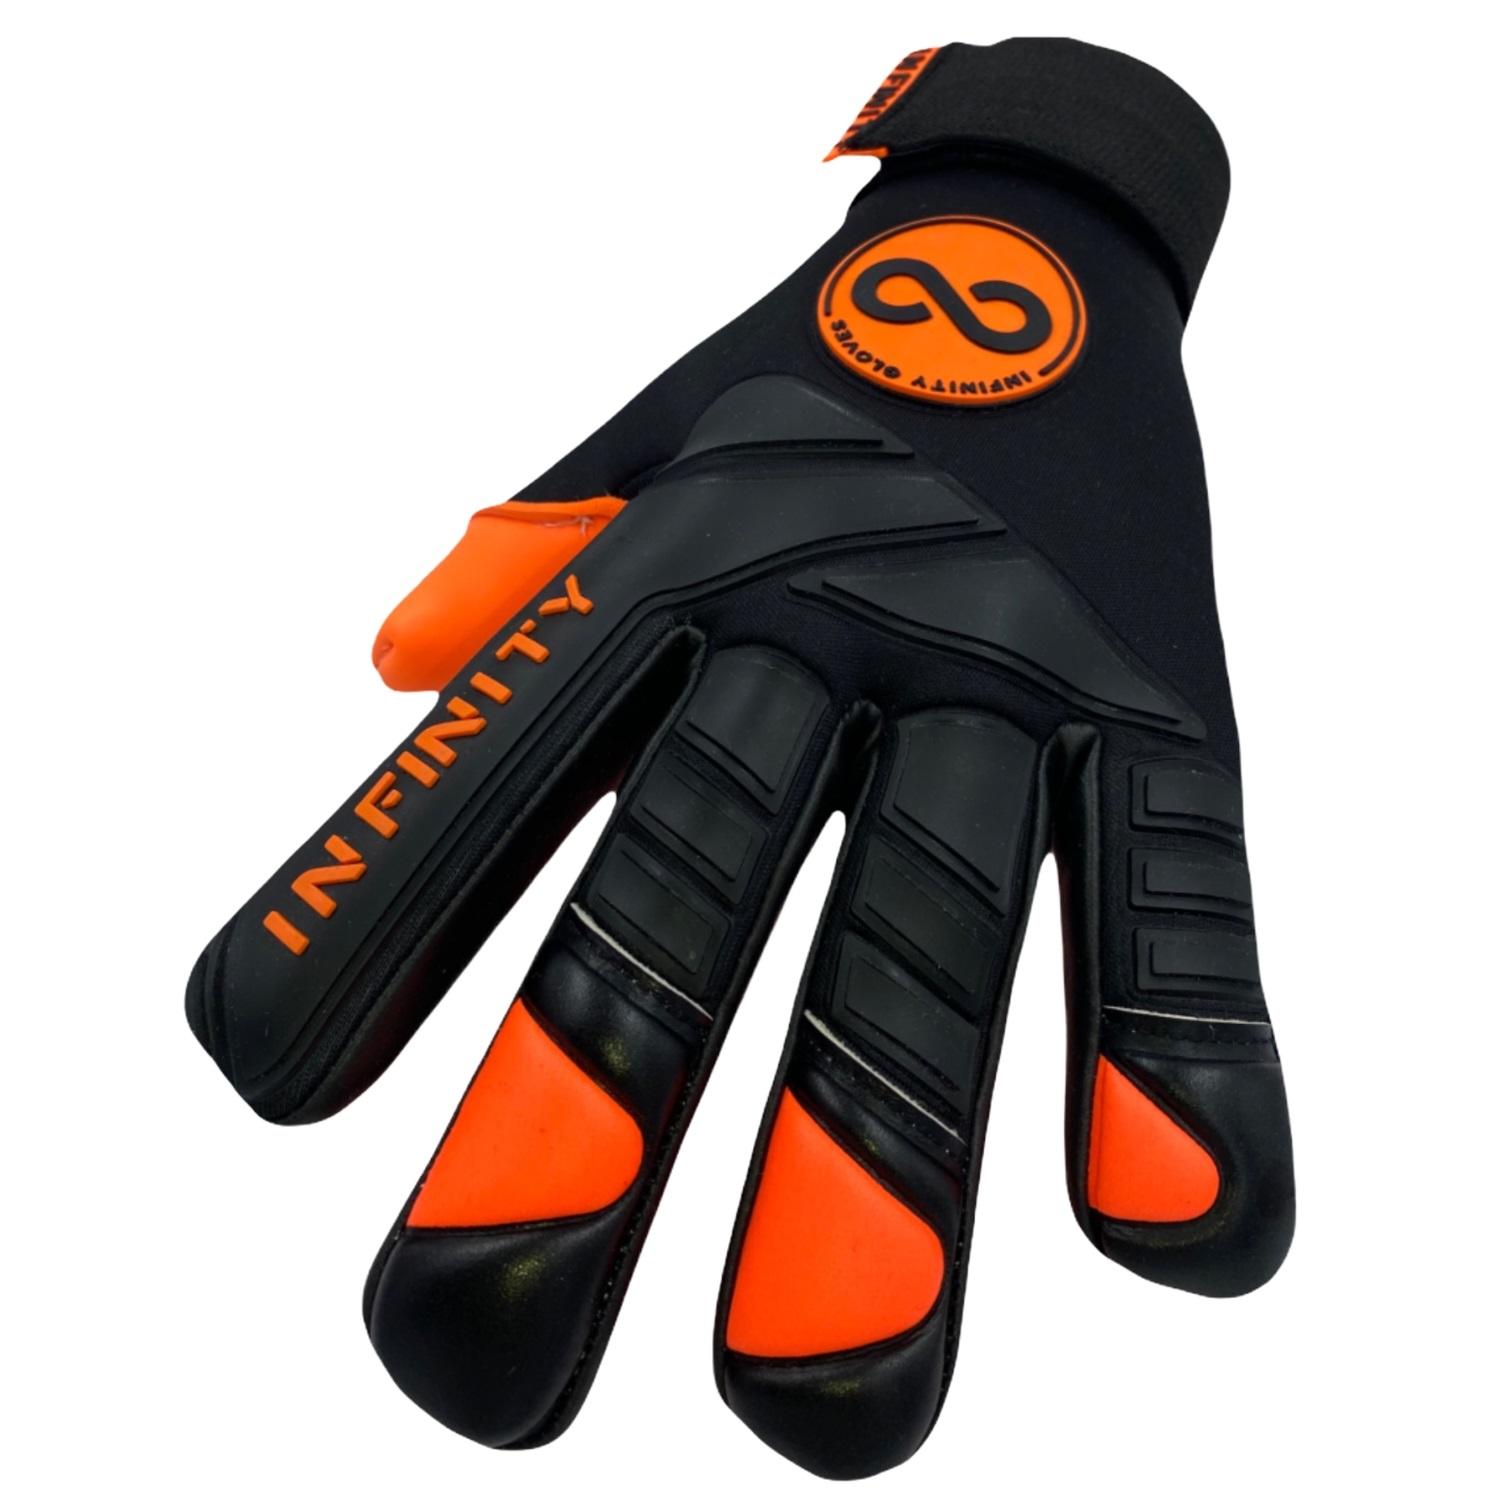 Luva de Goleiro Profissional Infinity Delta Orange